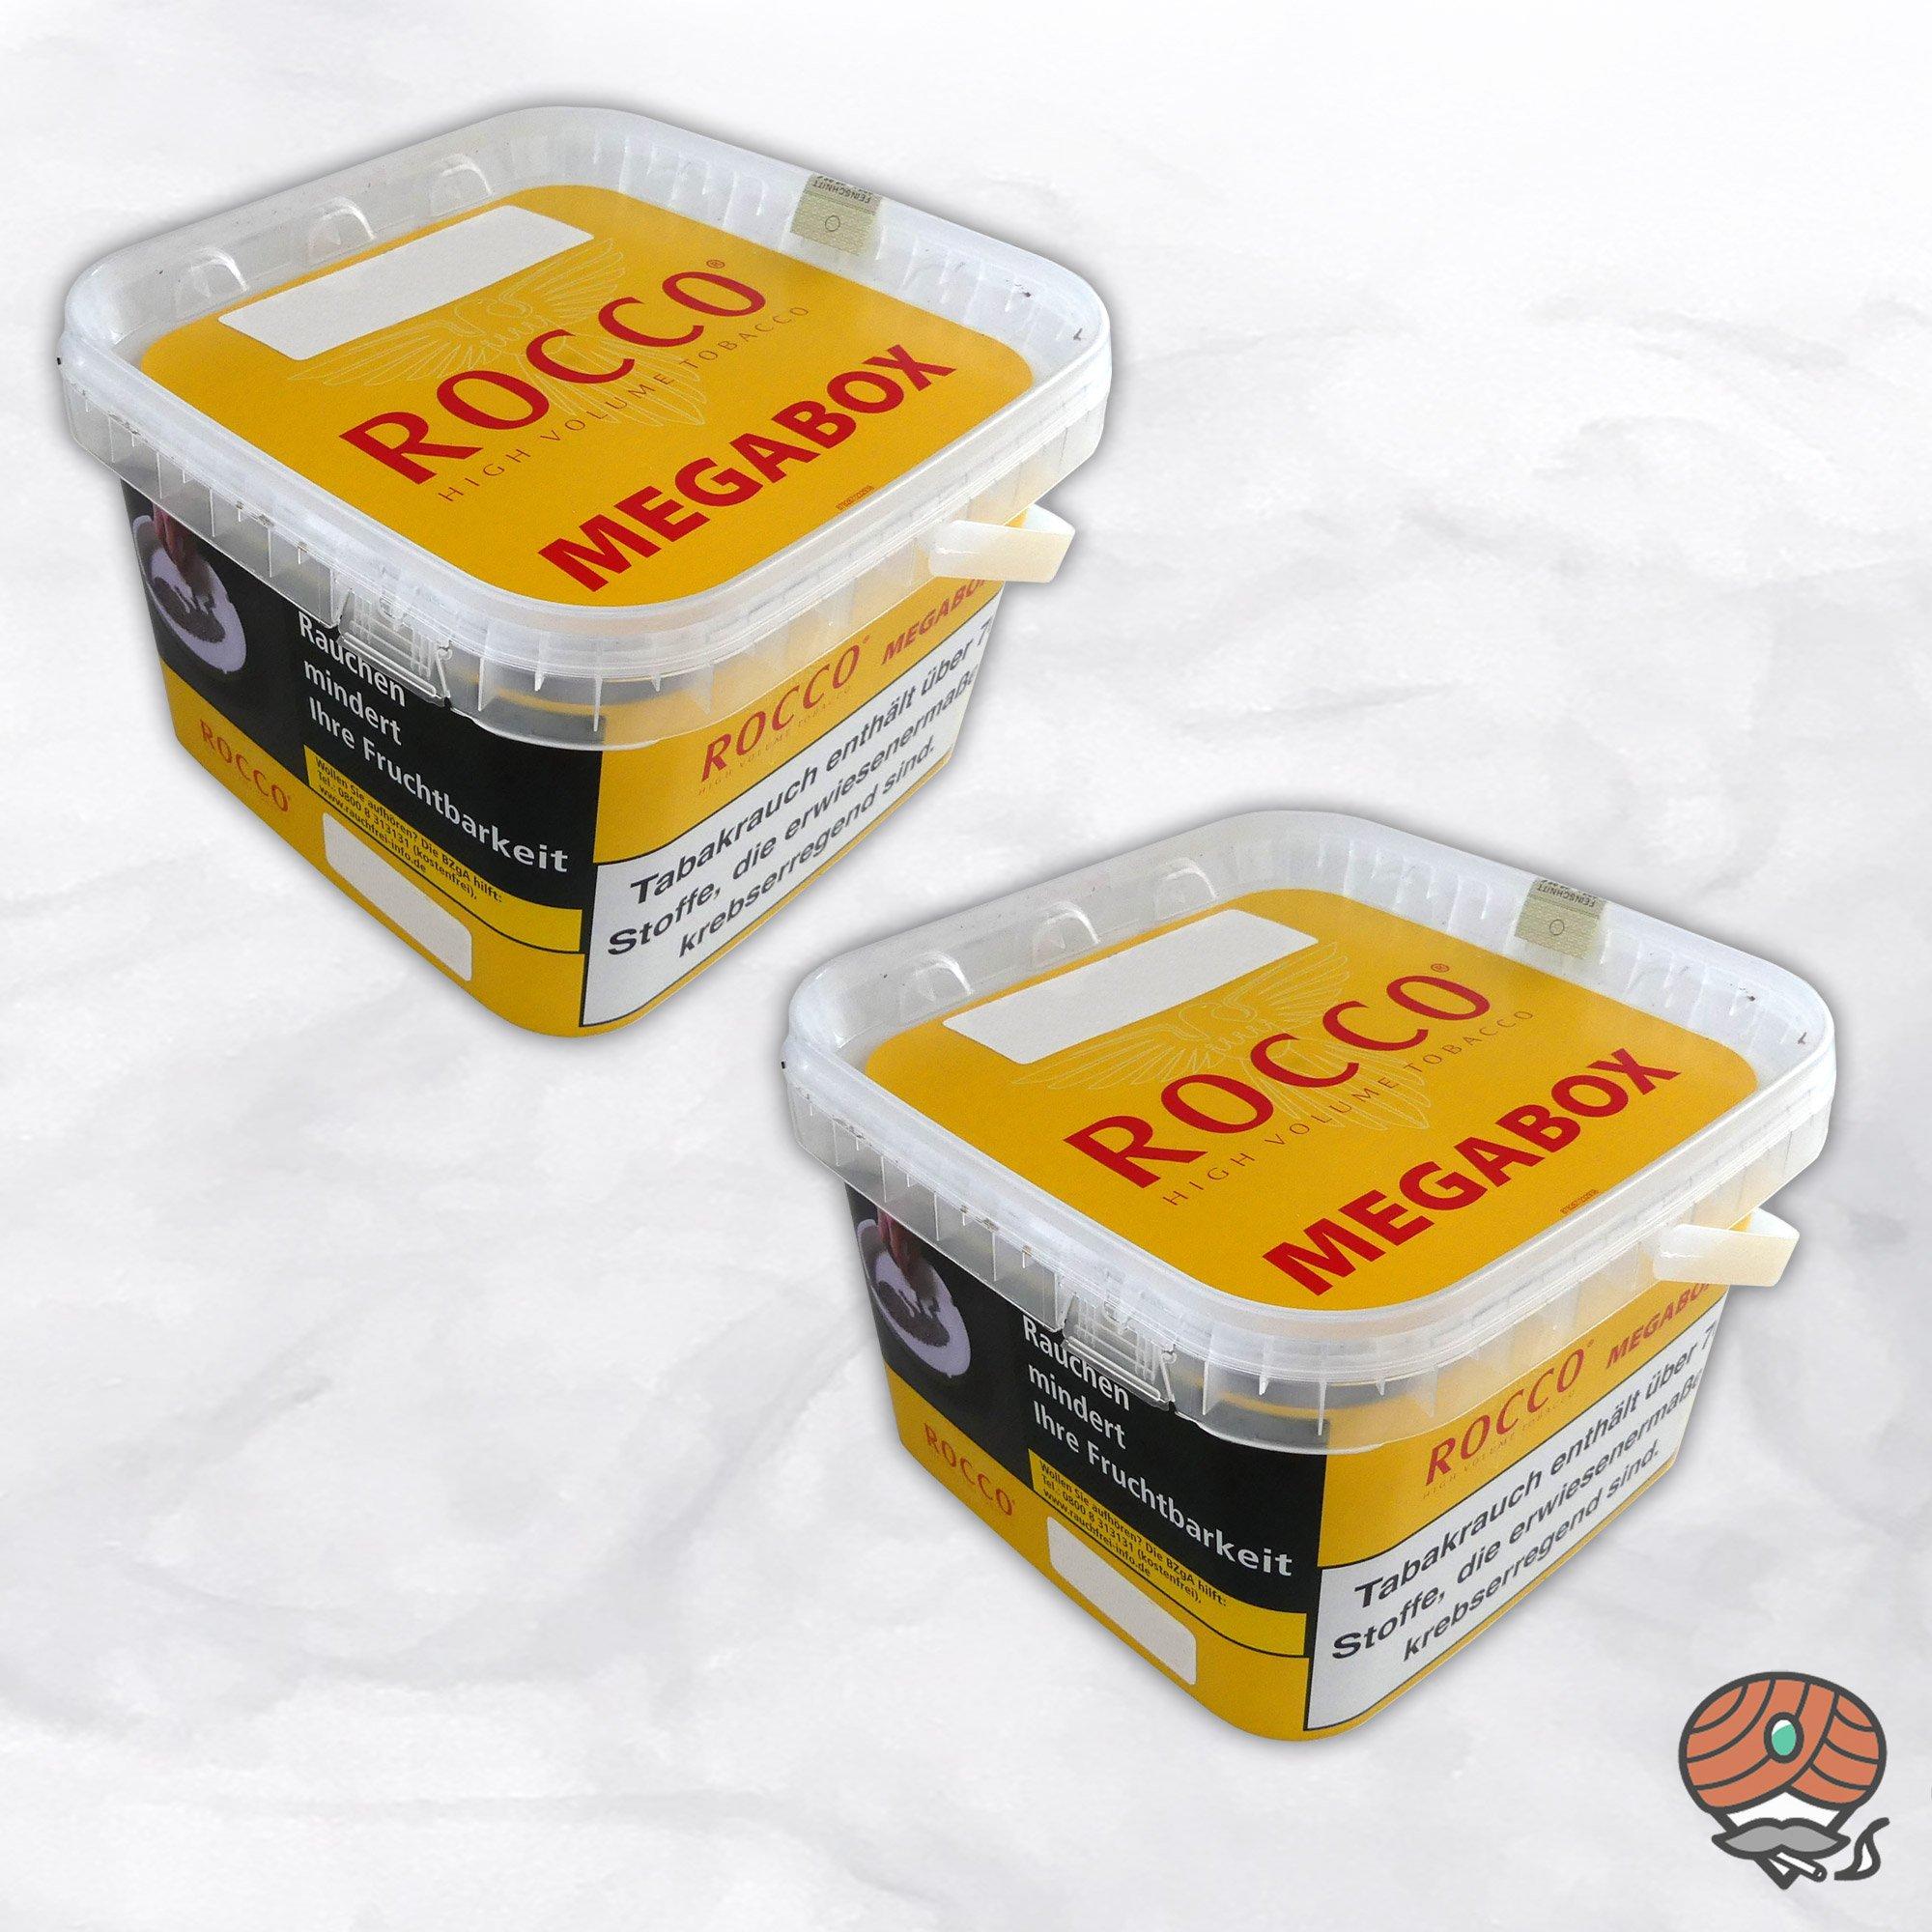 2 x ROCCO Tabak / Volumentabak Gelb Megabox 210 g